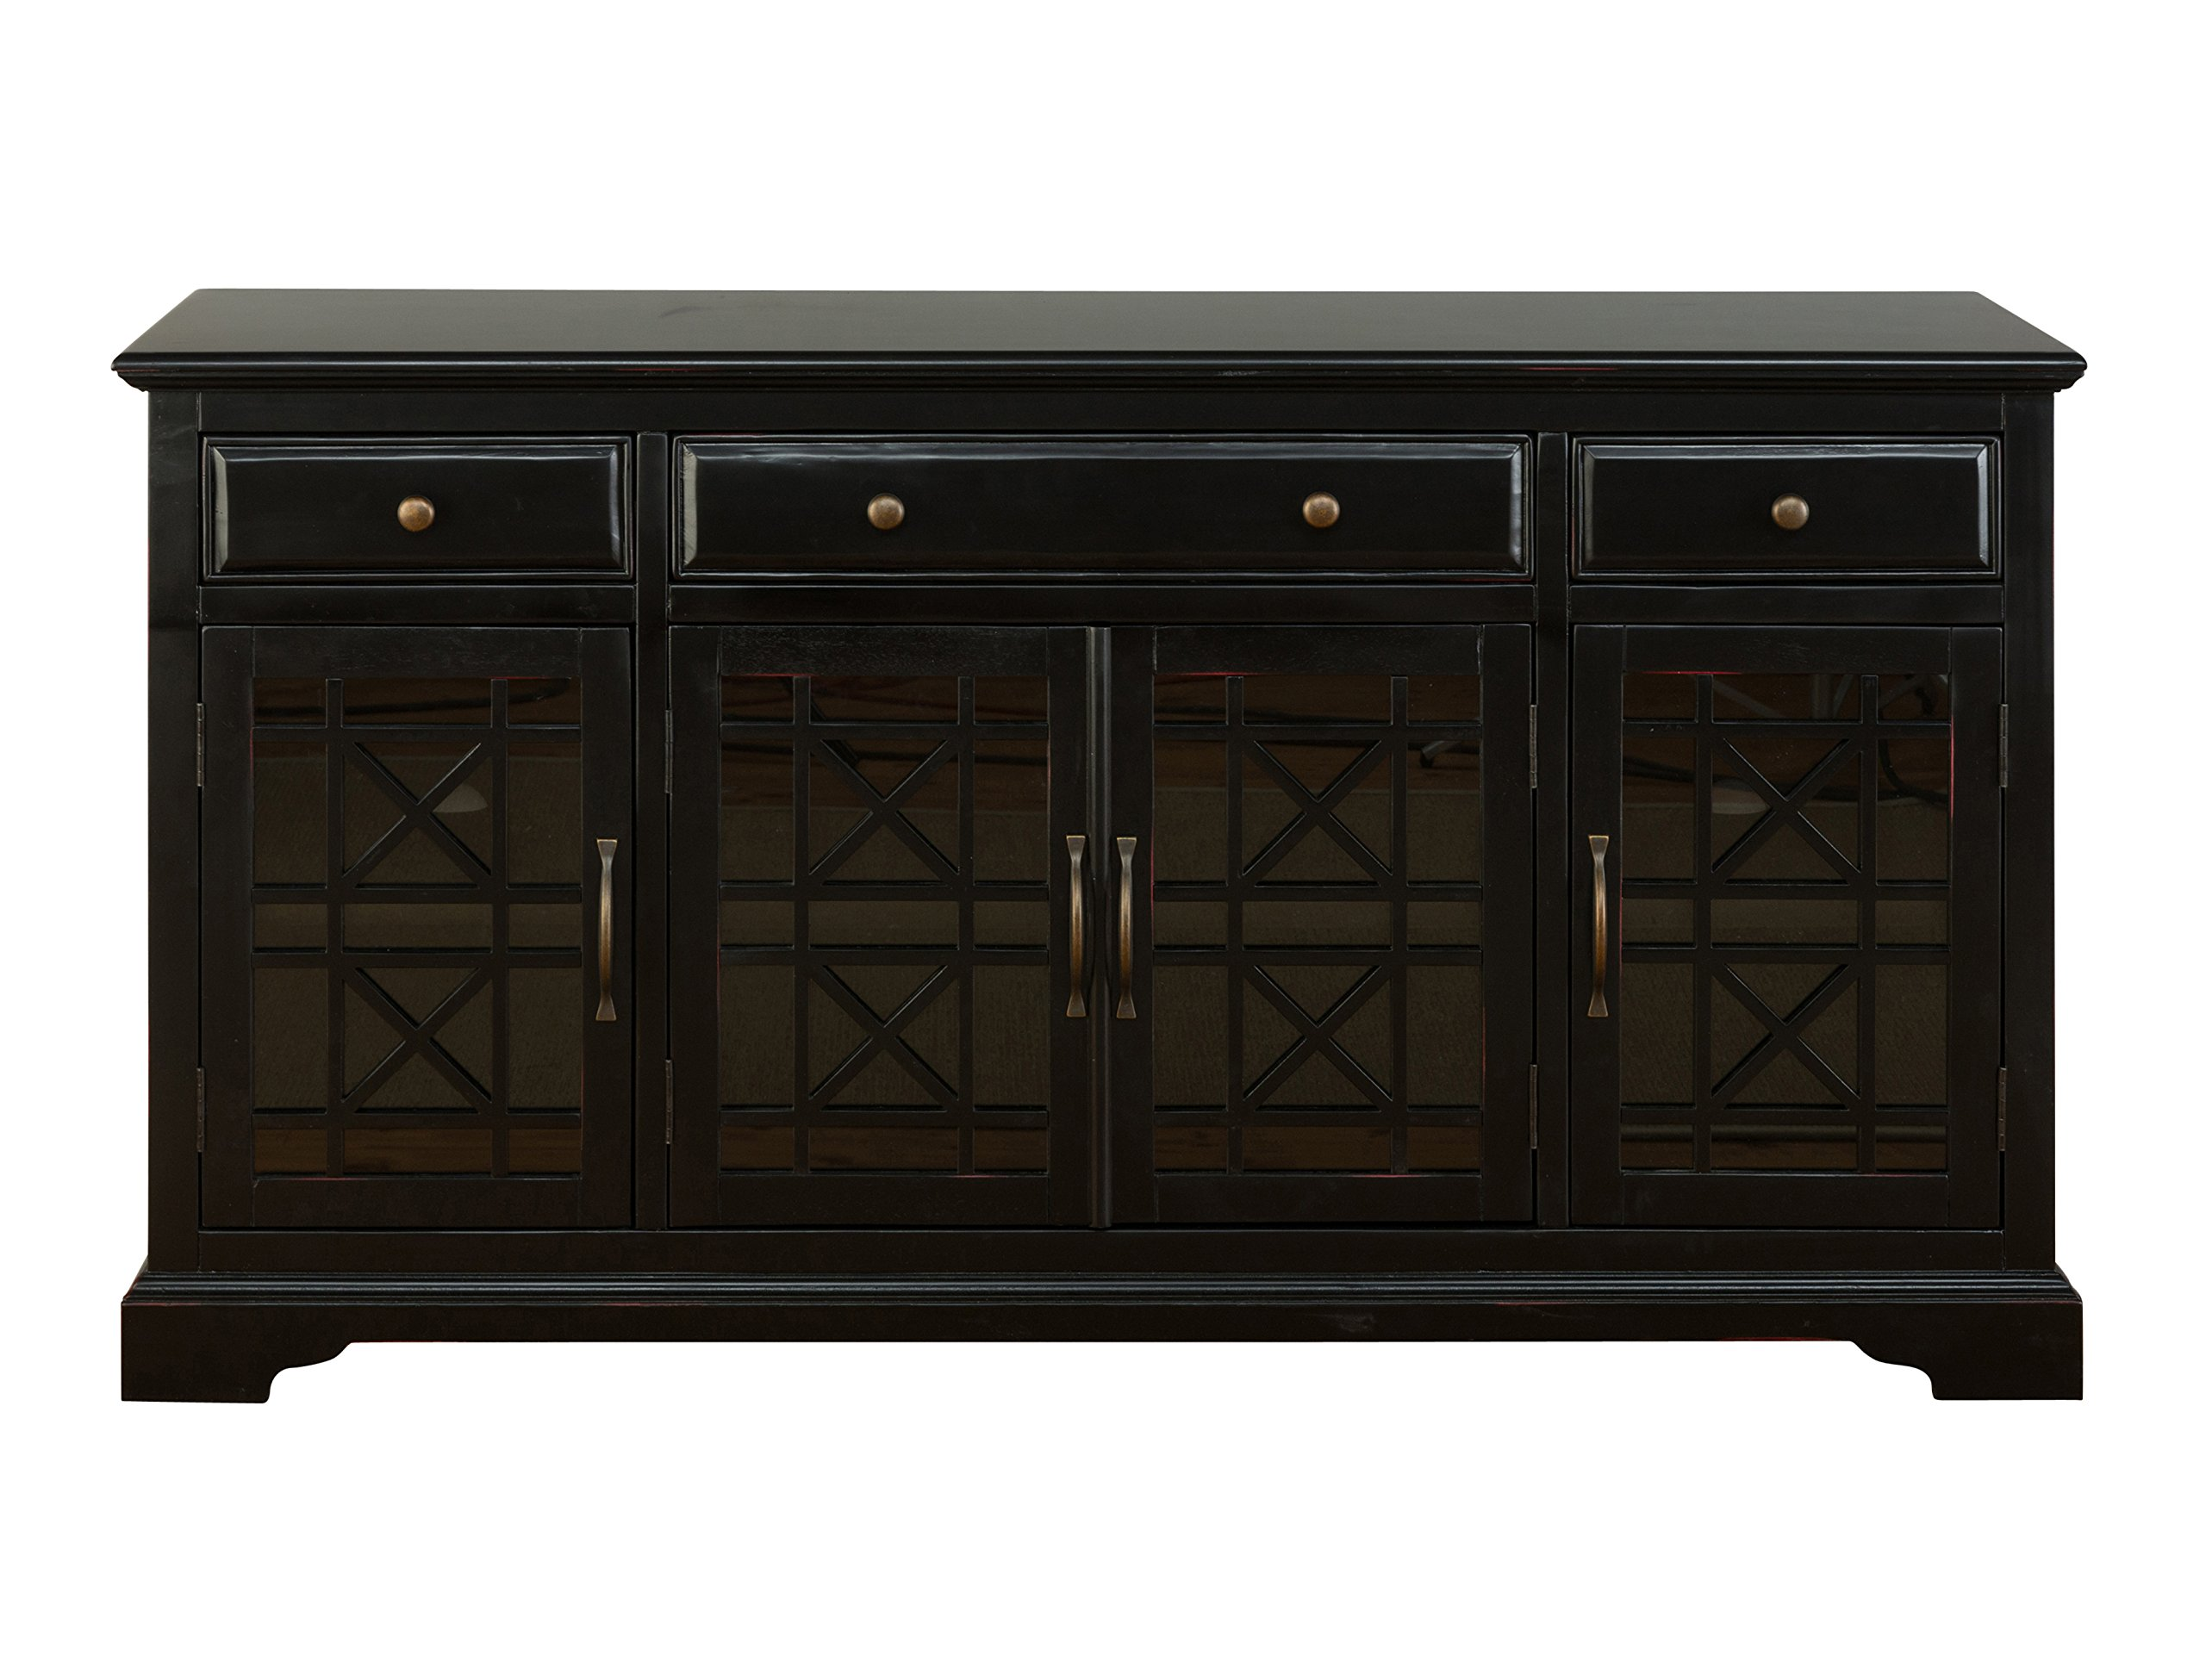 Jofran 275-60, Craftsman, 60'' Media Unit, 60'' W X 19'' D X 32'' H, Antique Black Finish, (Set of 1)